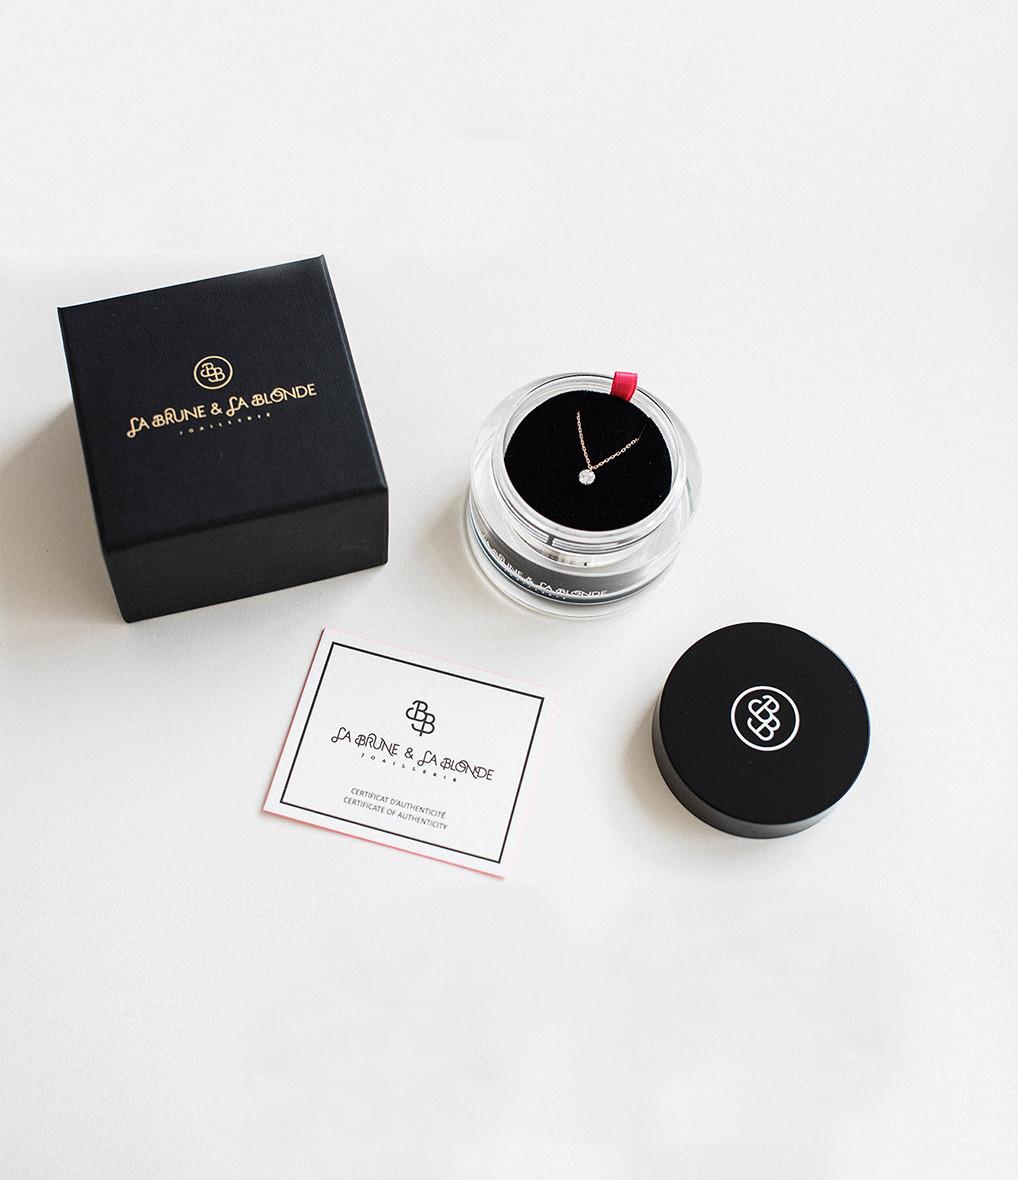 LA BRUNE & LA BLONDE - Collier Confetti Émeraude Or Jaune